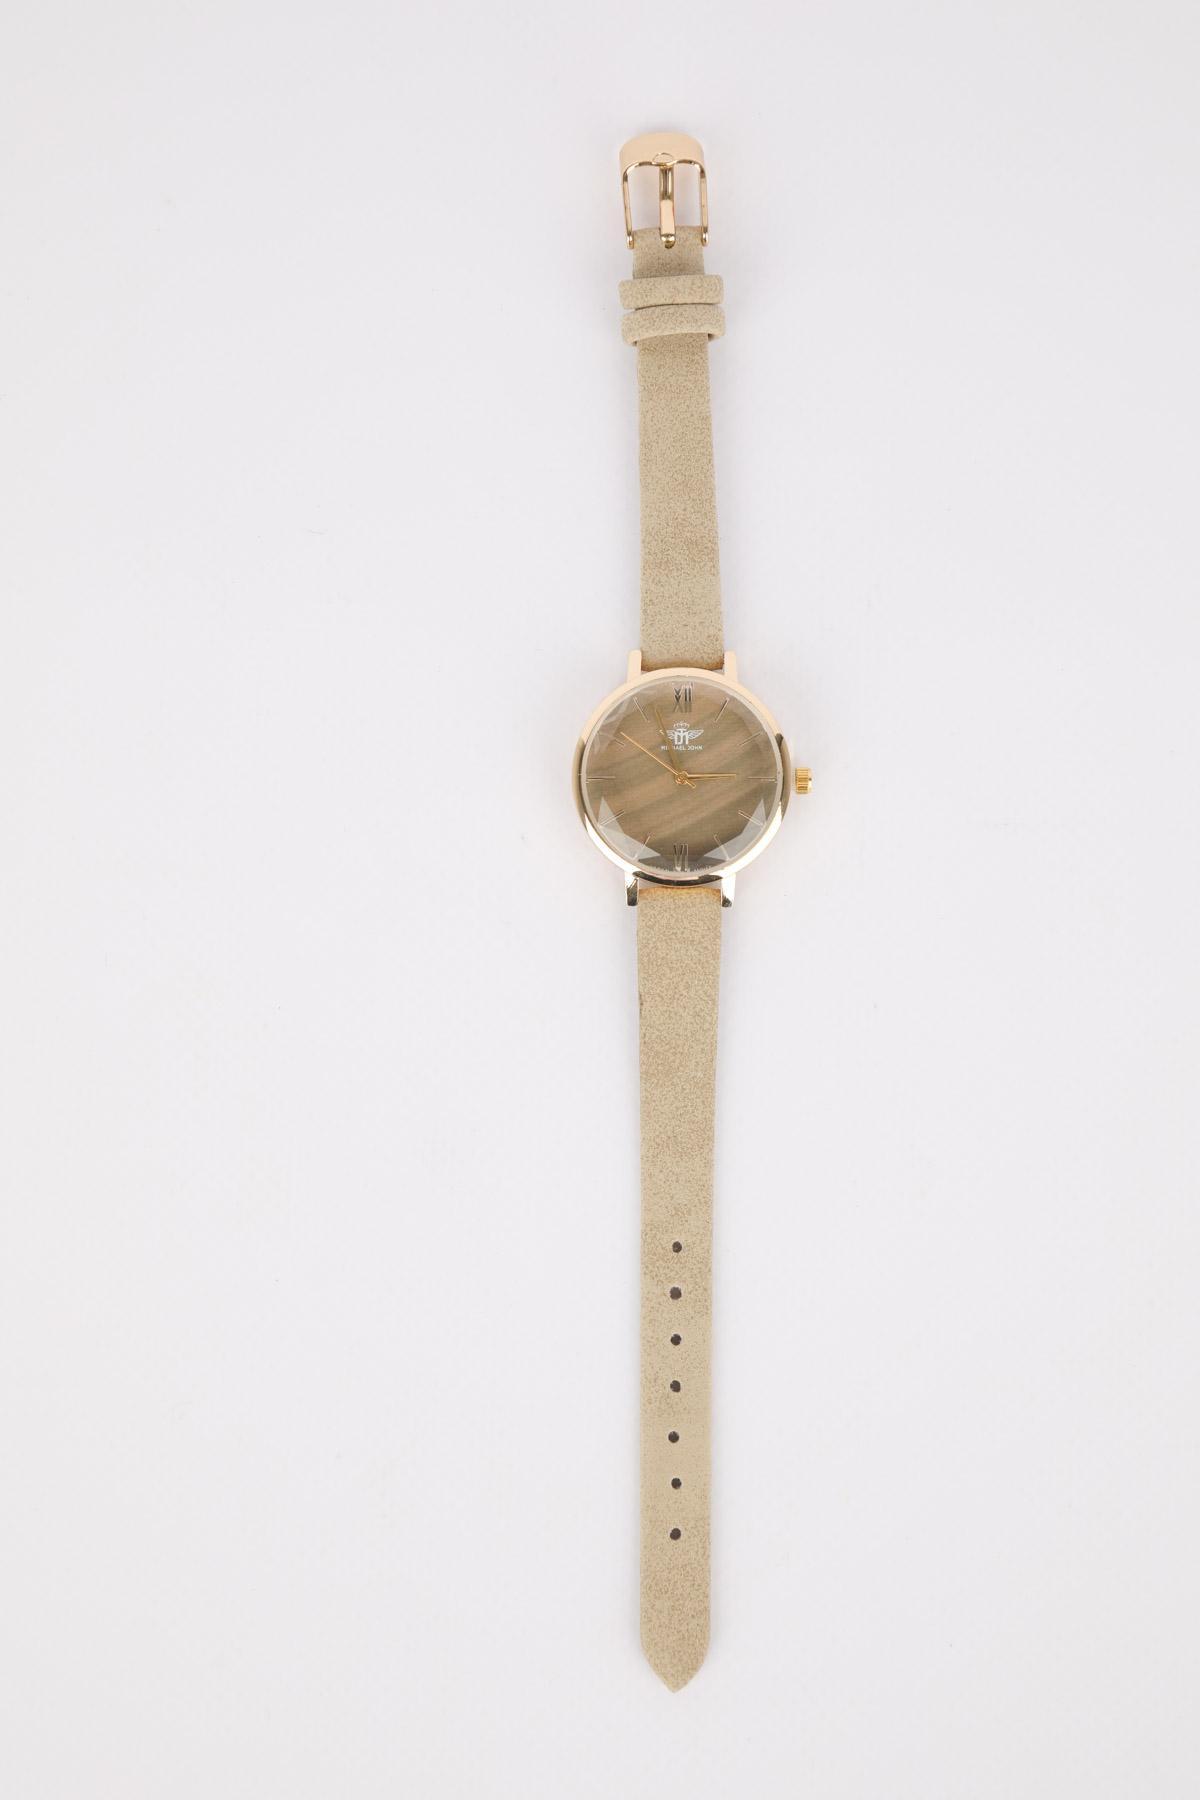 Orologi Accessori Taupe MICHAEL JOHN ET GG LUXE KH-190406 #c eFashion Paris